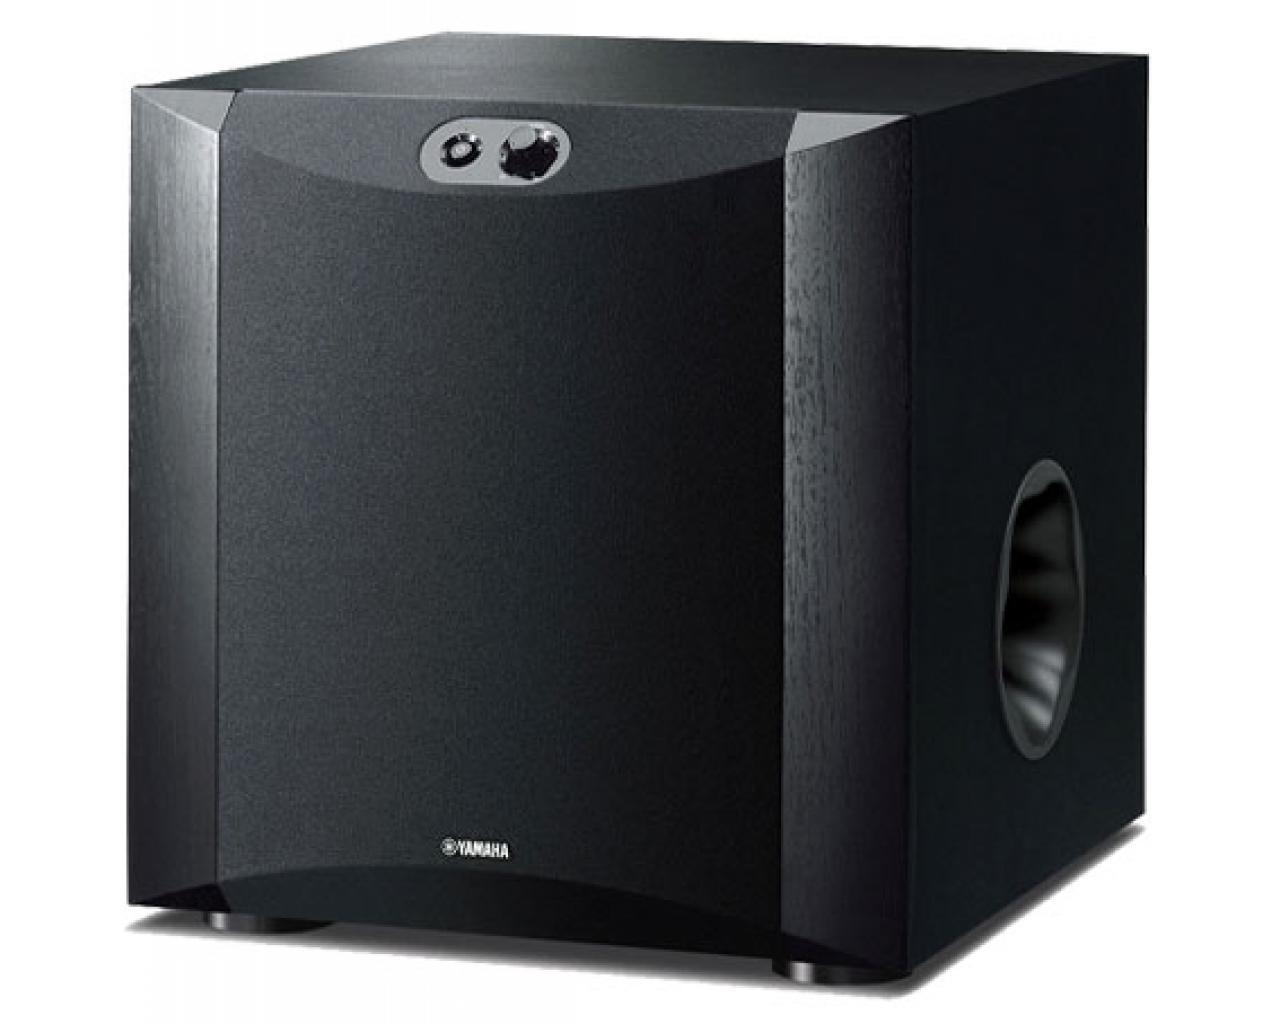 Yamaha YSP-5600 Soundbar Subwoofer